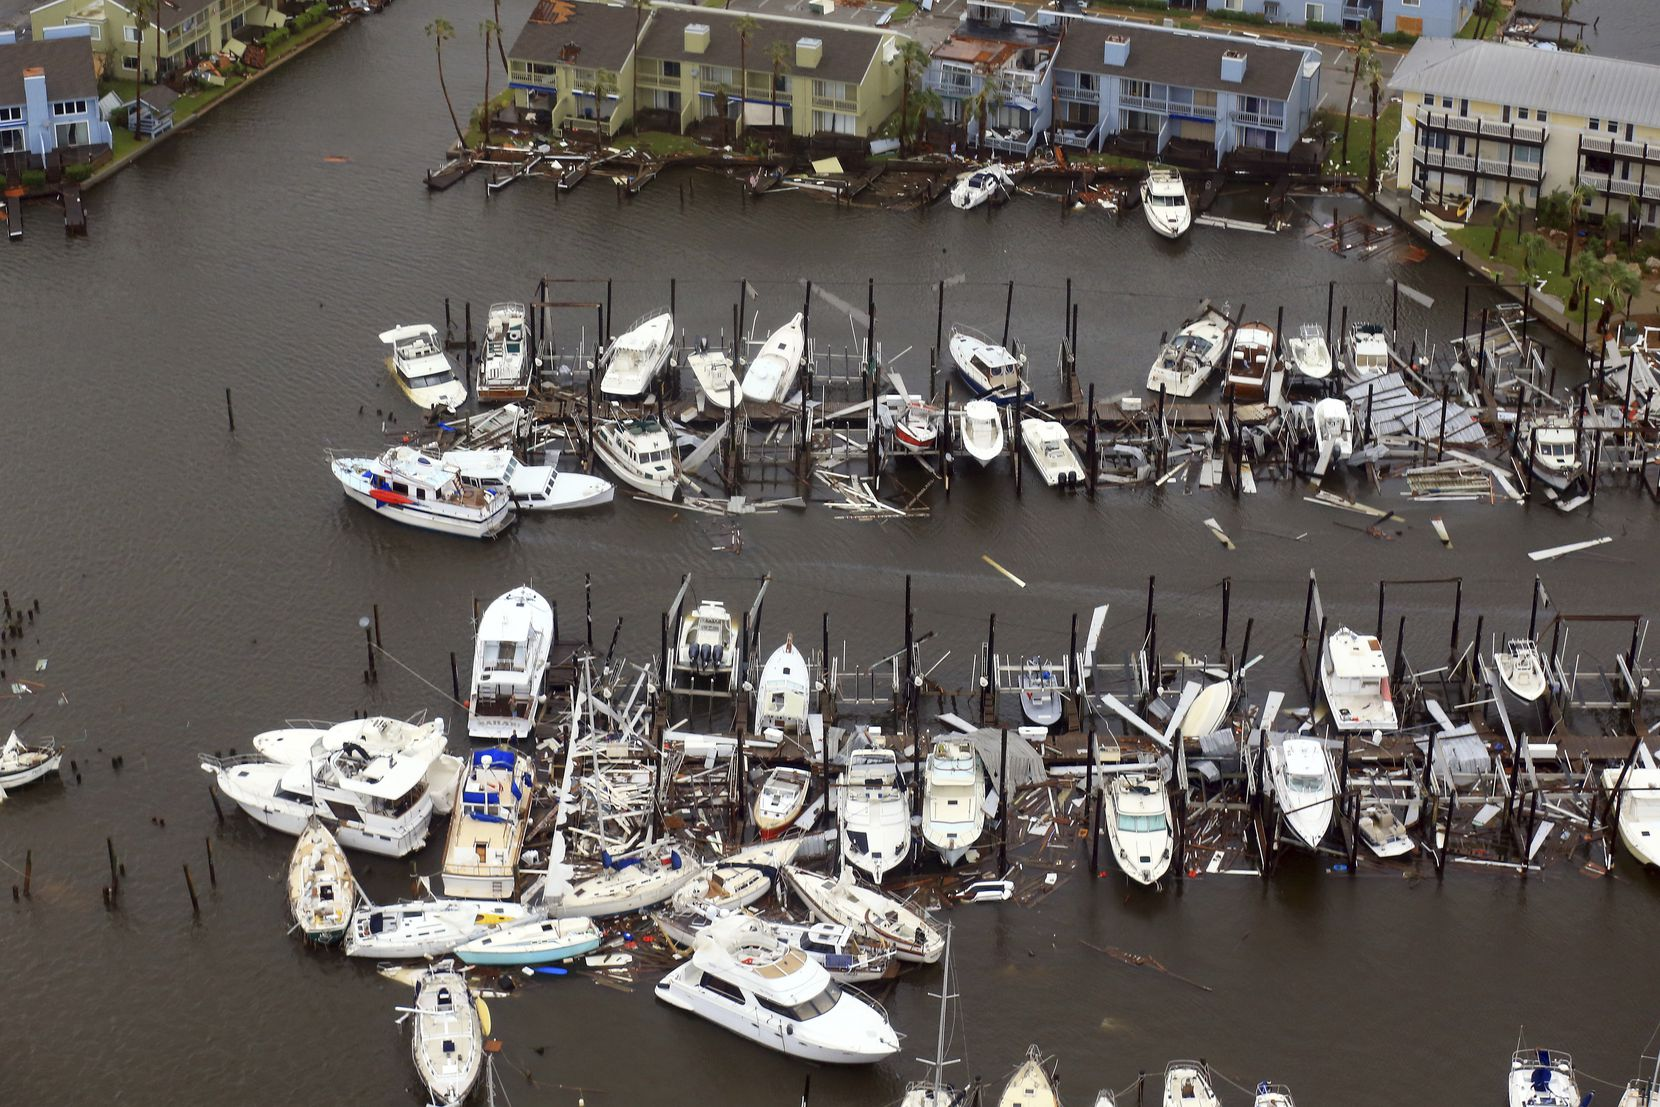 This aerial photo shows damaged boats along a dock in the wake of Hurricane Harvey, Monday, Aug. 28, 2017, in Corpus Christi, Texas. Harvey hit the coast as a Category 4 hurricane. (Gabe Hernandez/Corpus Christi Caller-Times via AP)